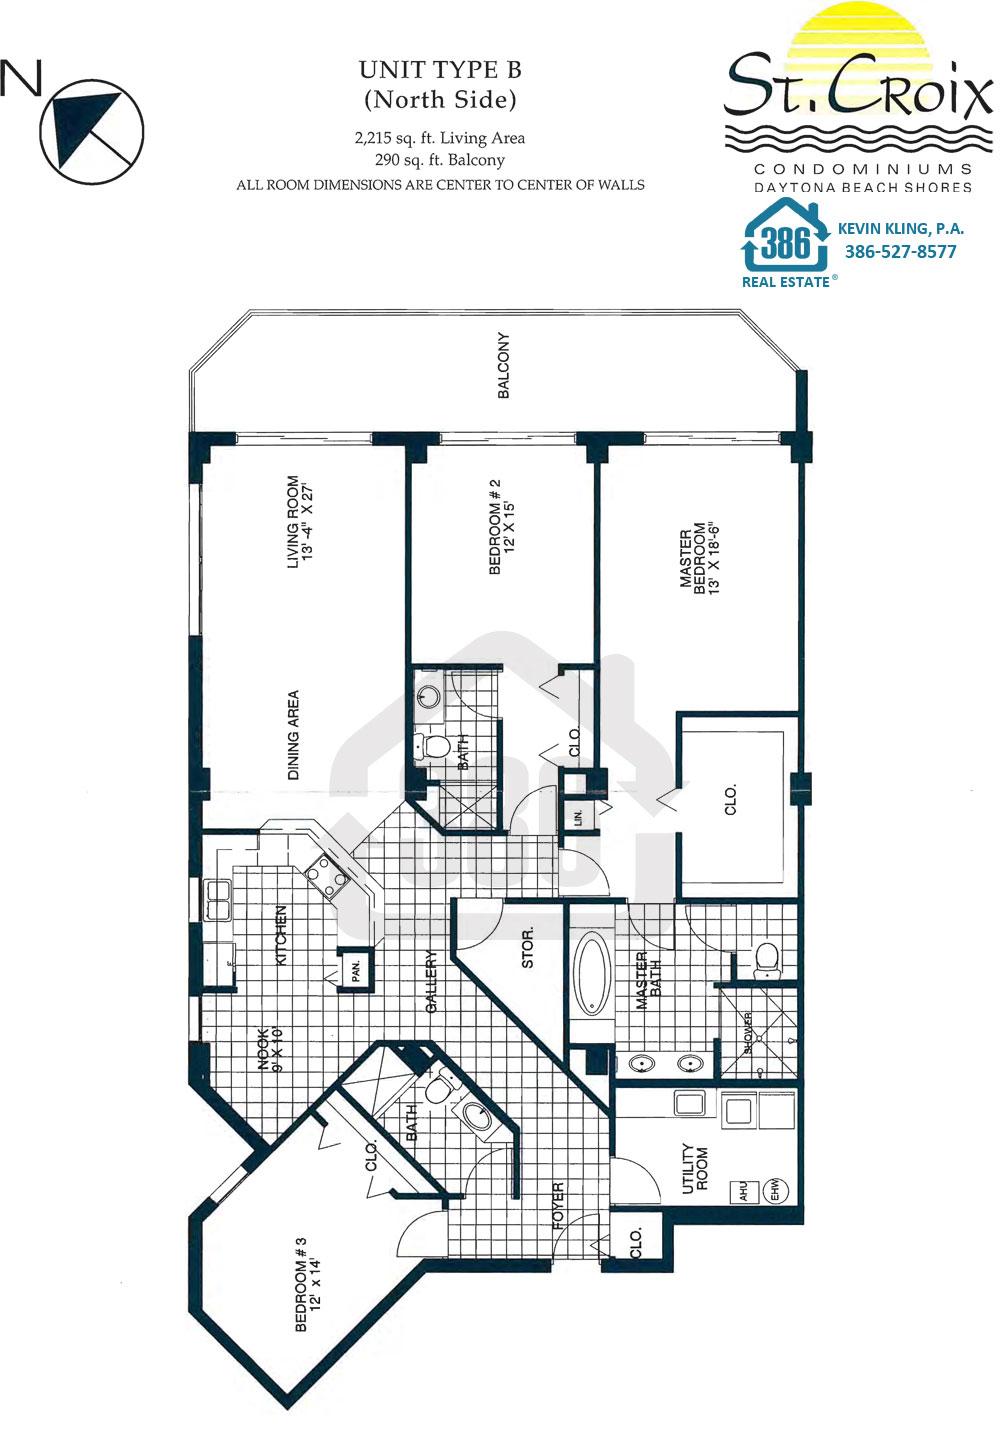 St. Croix 02 Plan